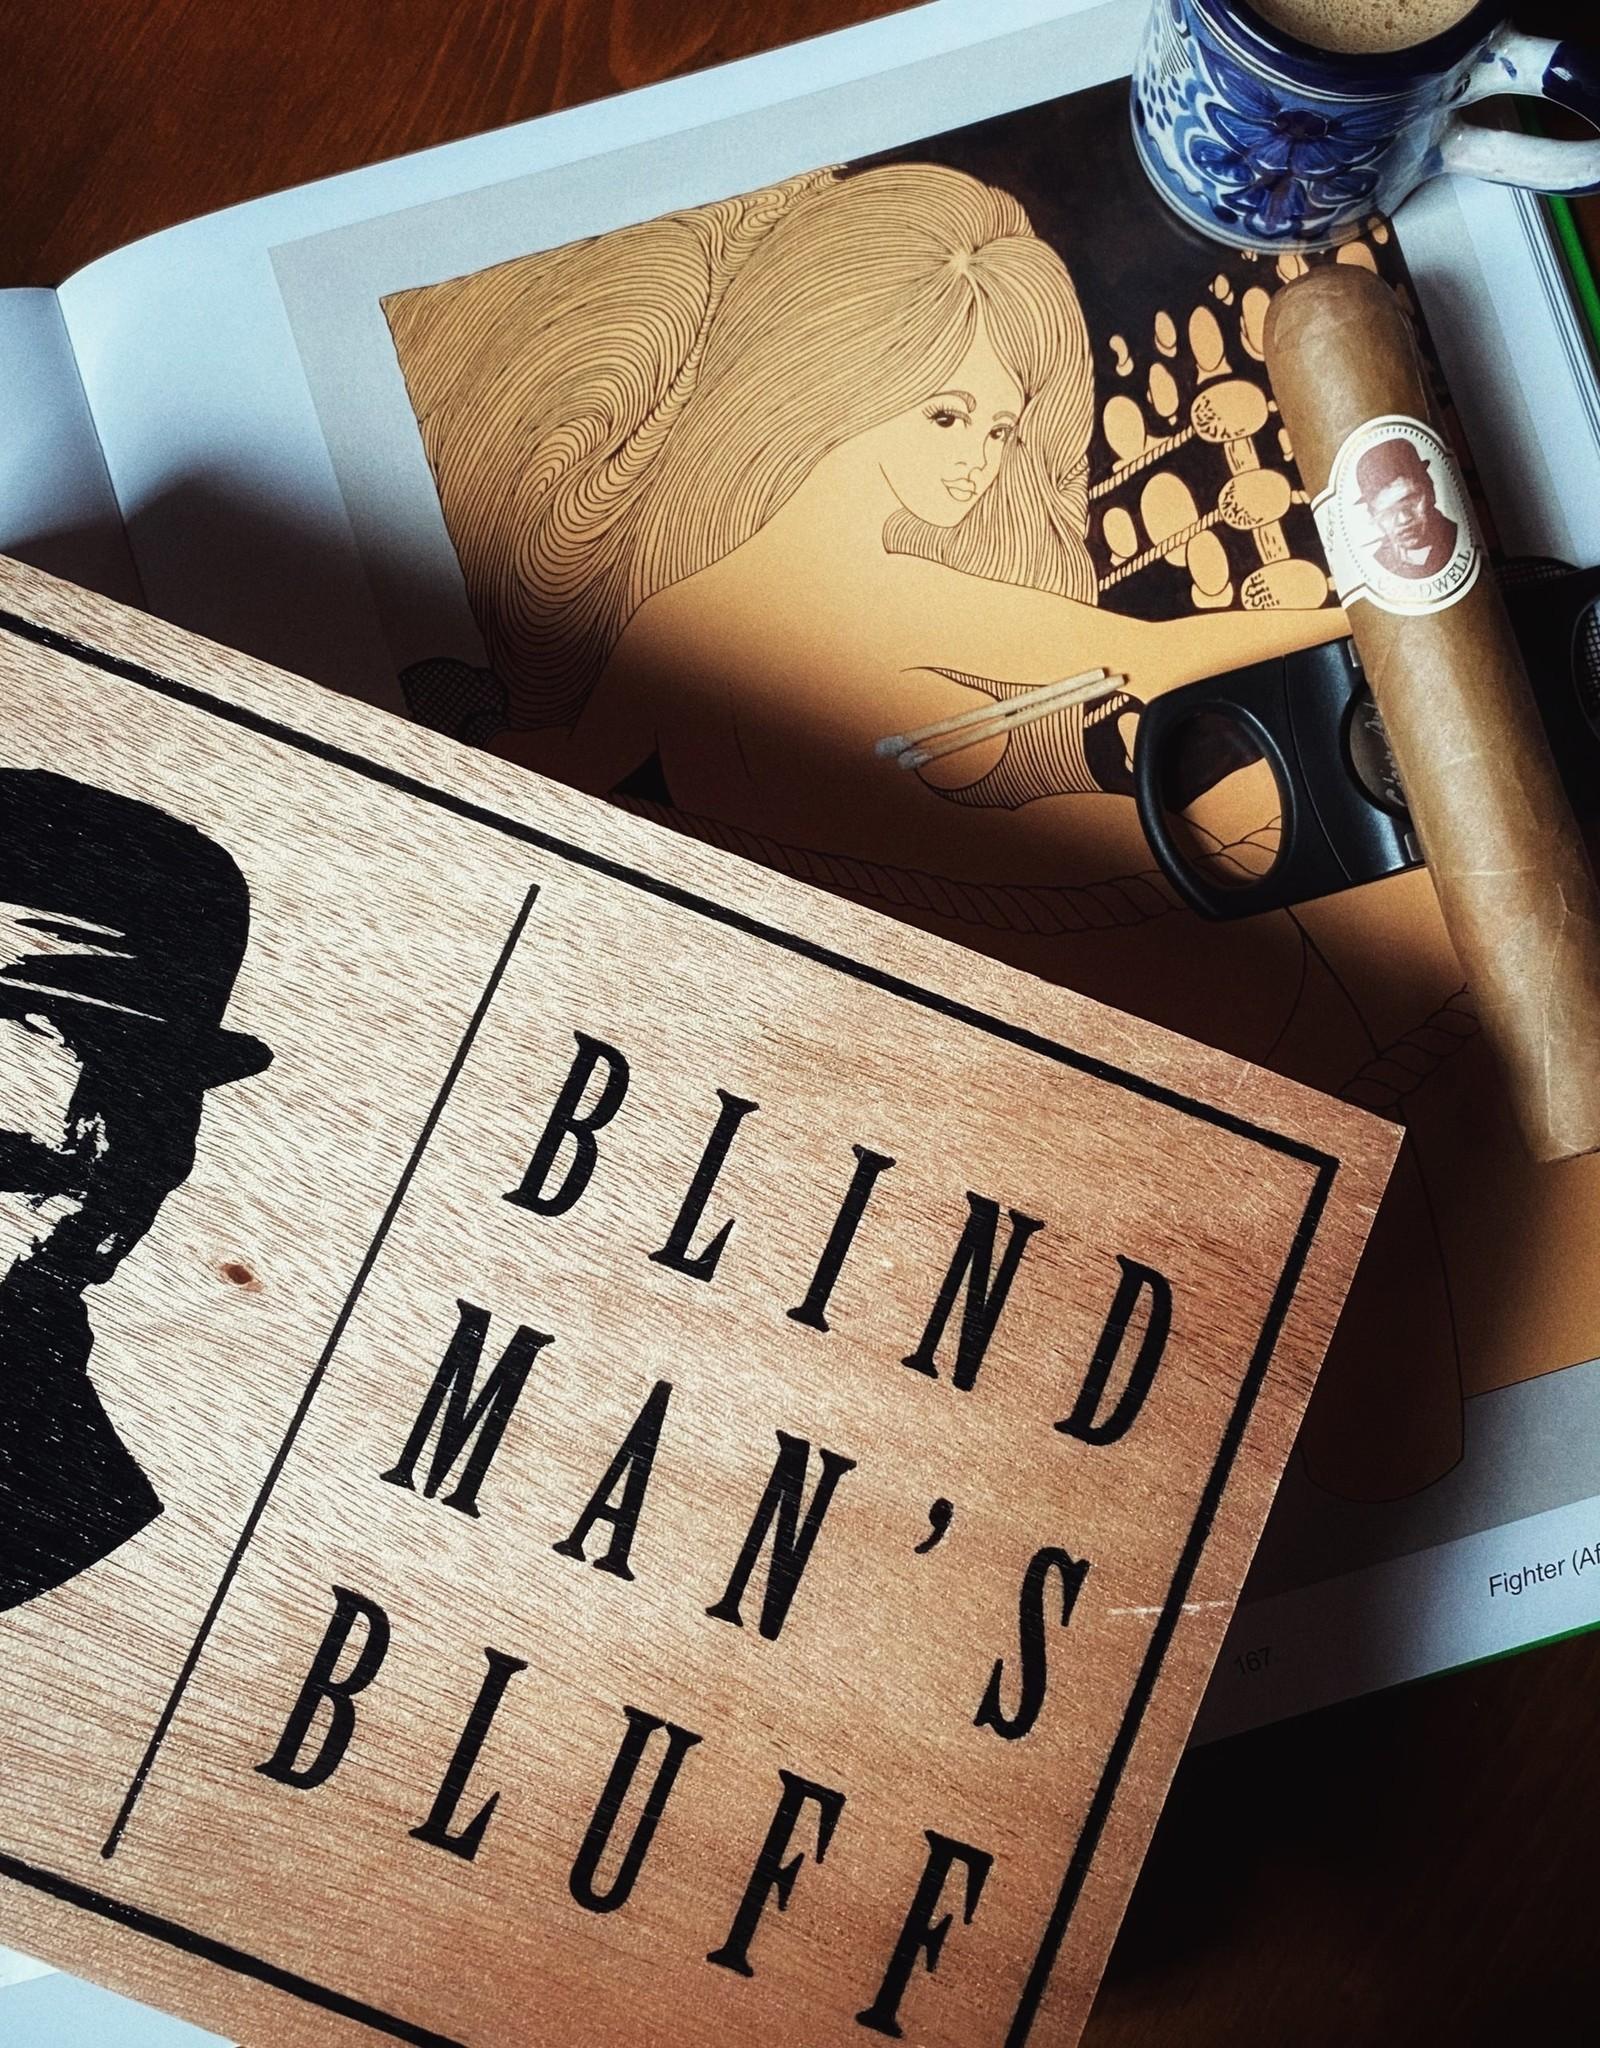 Caldwell Cigar Co Caldwell Blind Man's Bluff Connecticut 6 x 60 Five Pack